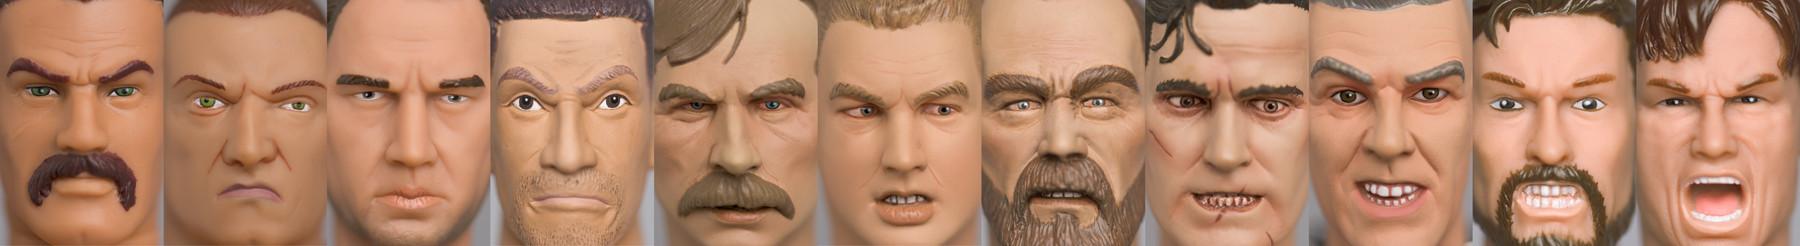 Taxonomy Anger